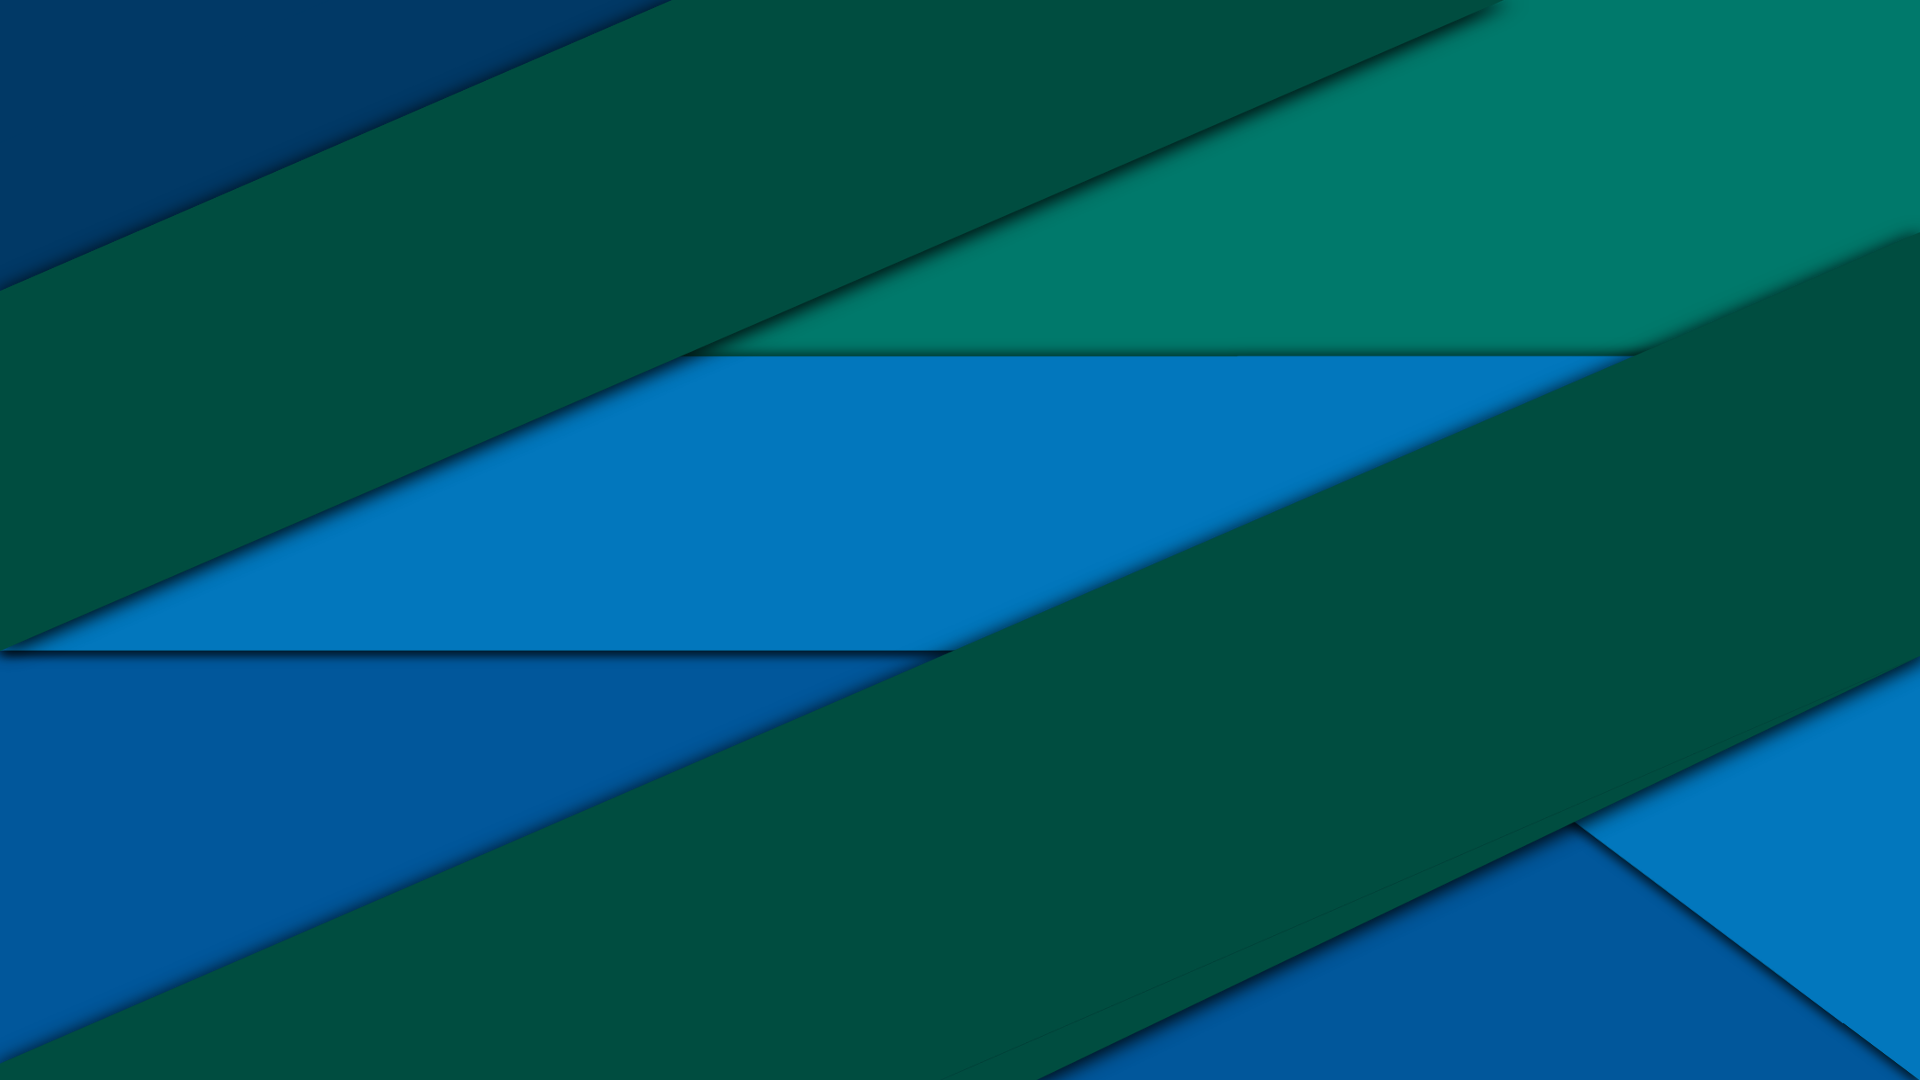 Material Wallpapers Hd: 40 Best Material Design Wallpapers 4K (2016) HD Windows 7